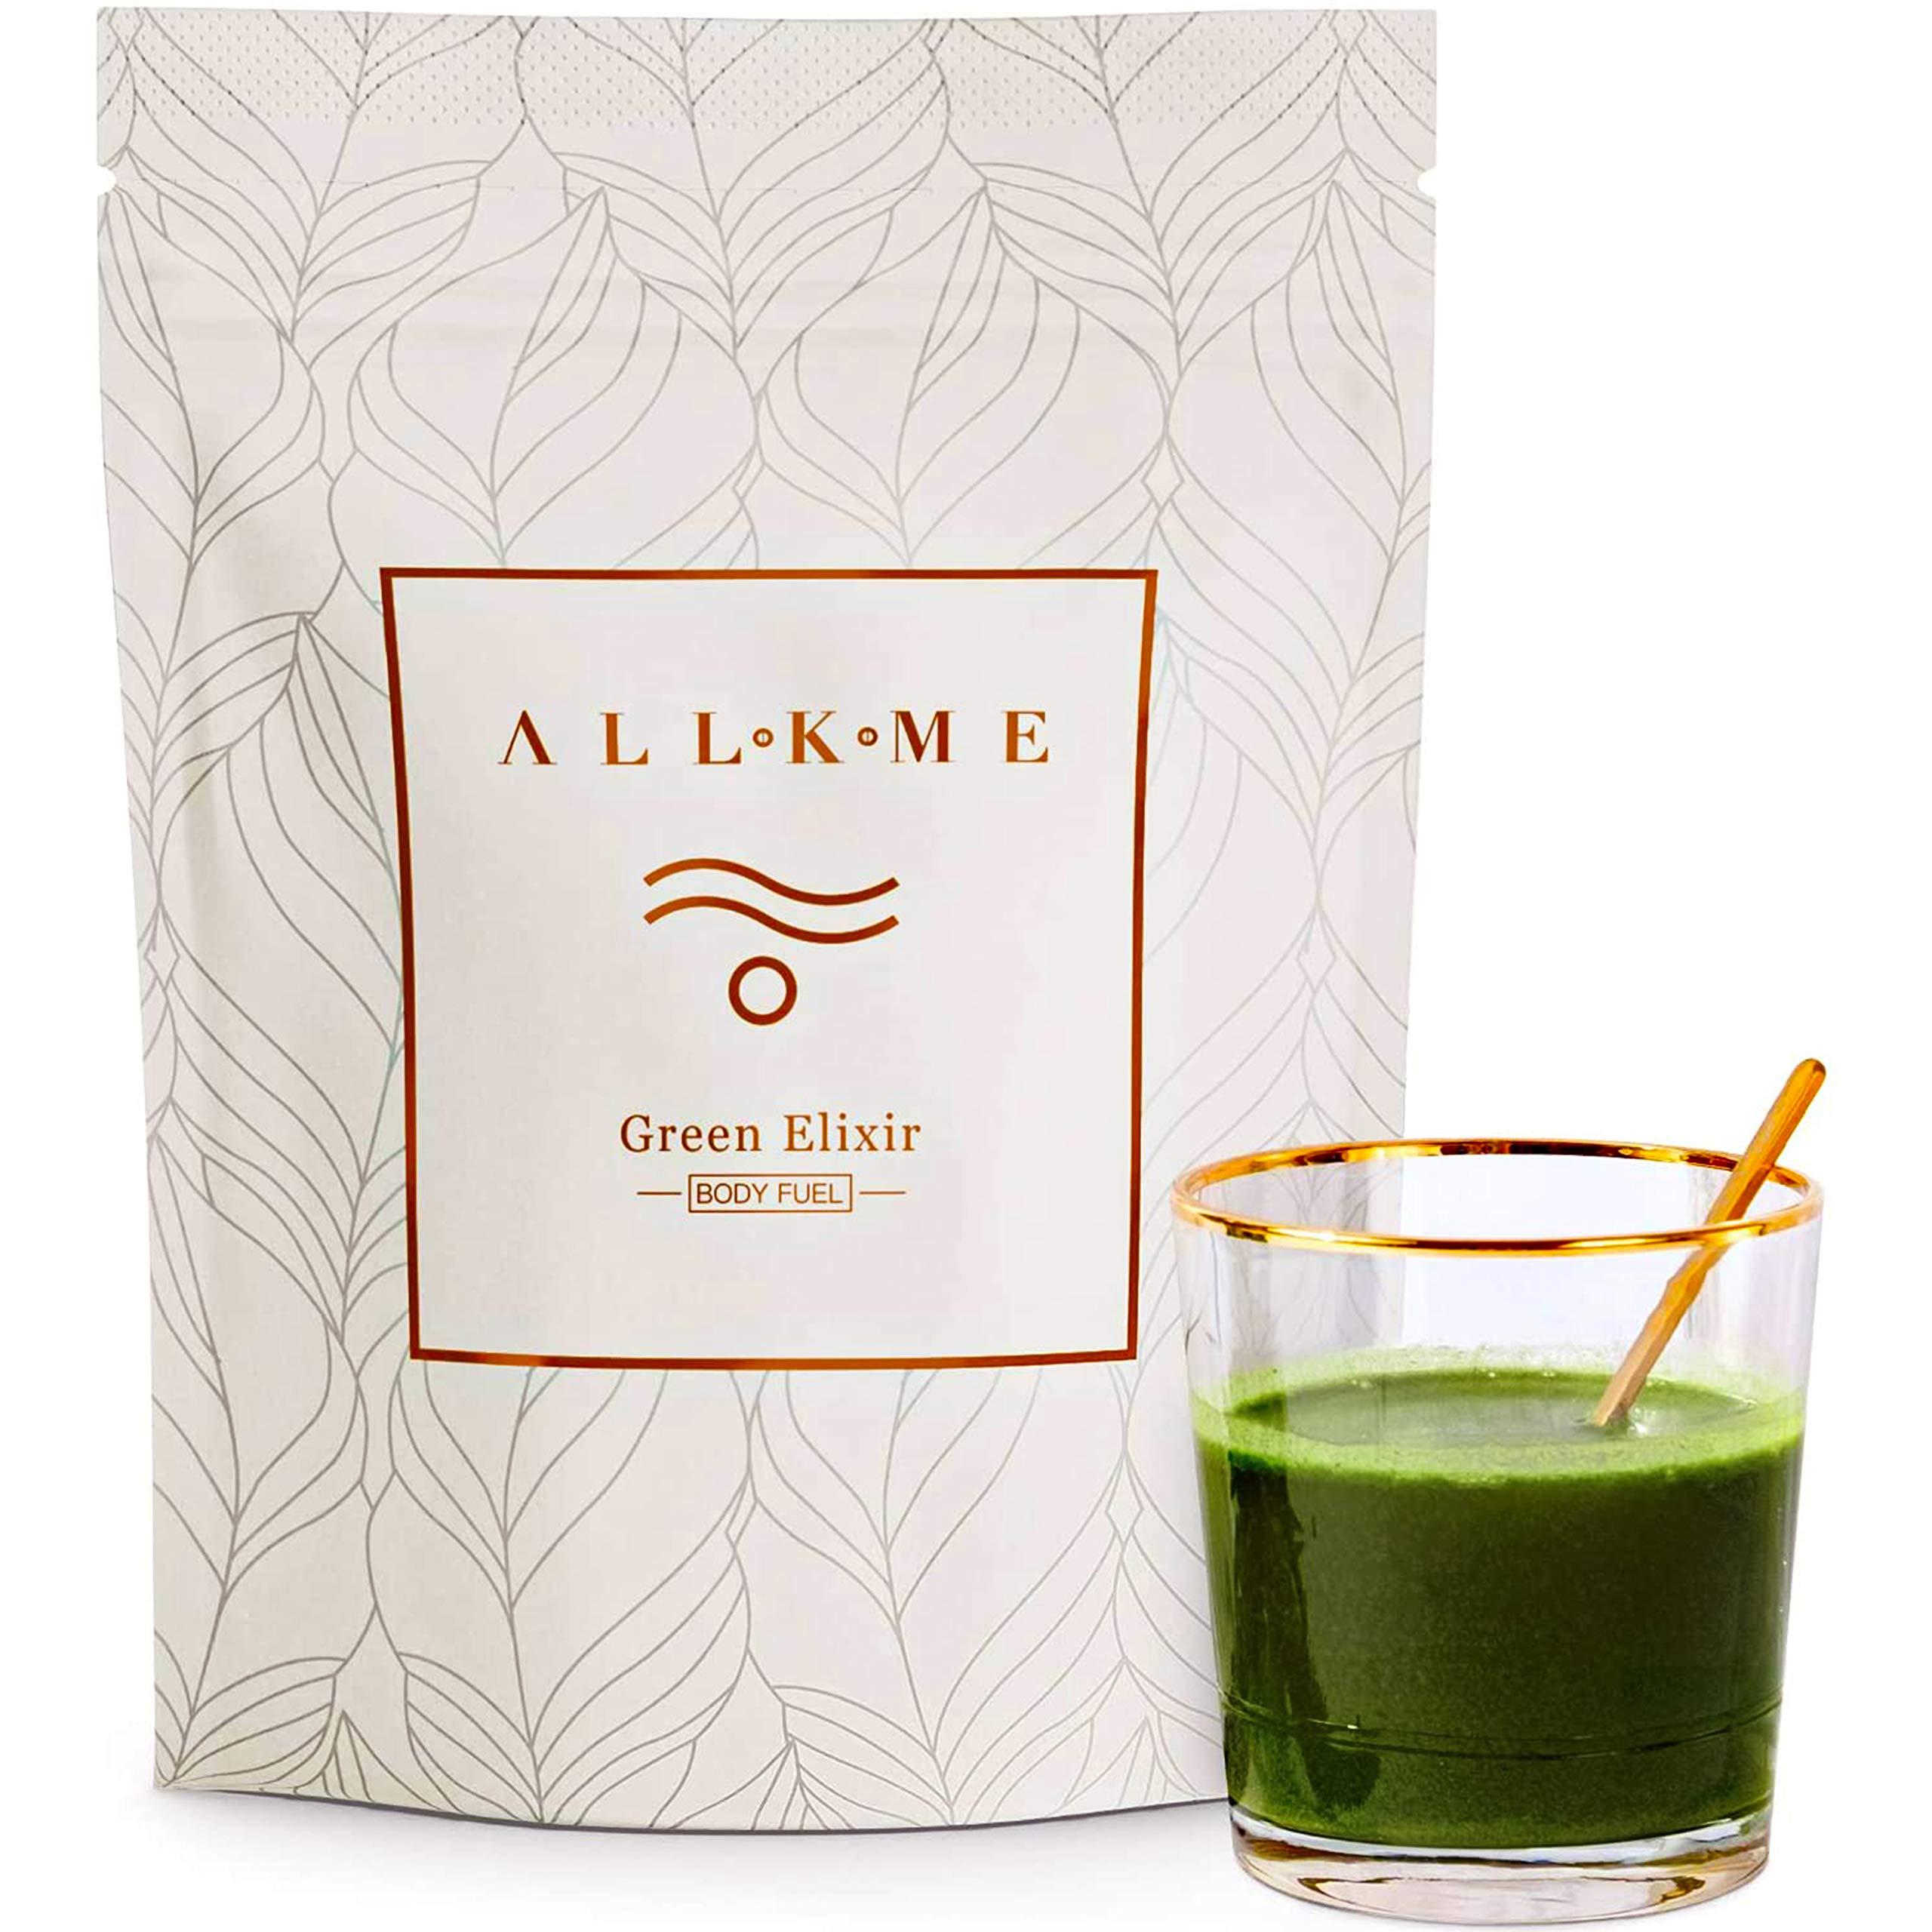 Super greens and Superfood powder - Green Drink: green tea, pea protein, psyllium husk, spirulina chlorella, aloe vera, turmeric, wheatgrass - detox drink with probiotics for adults